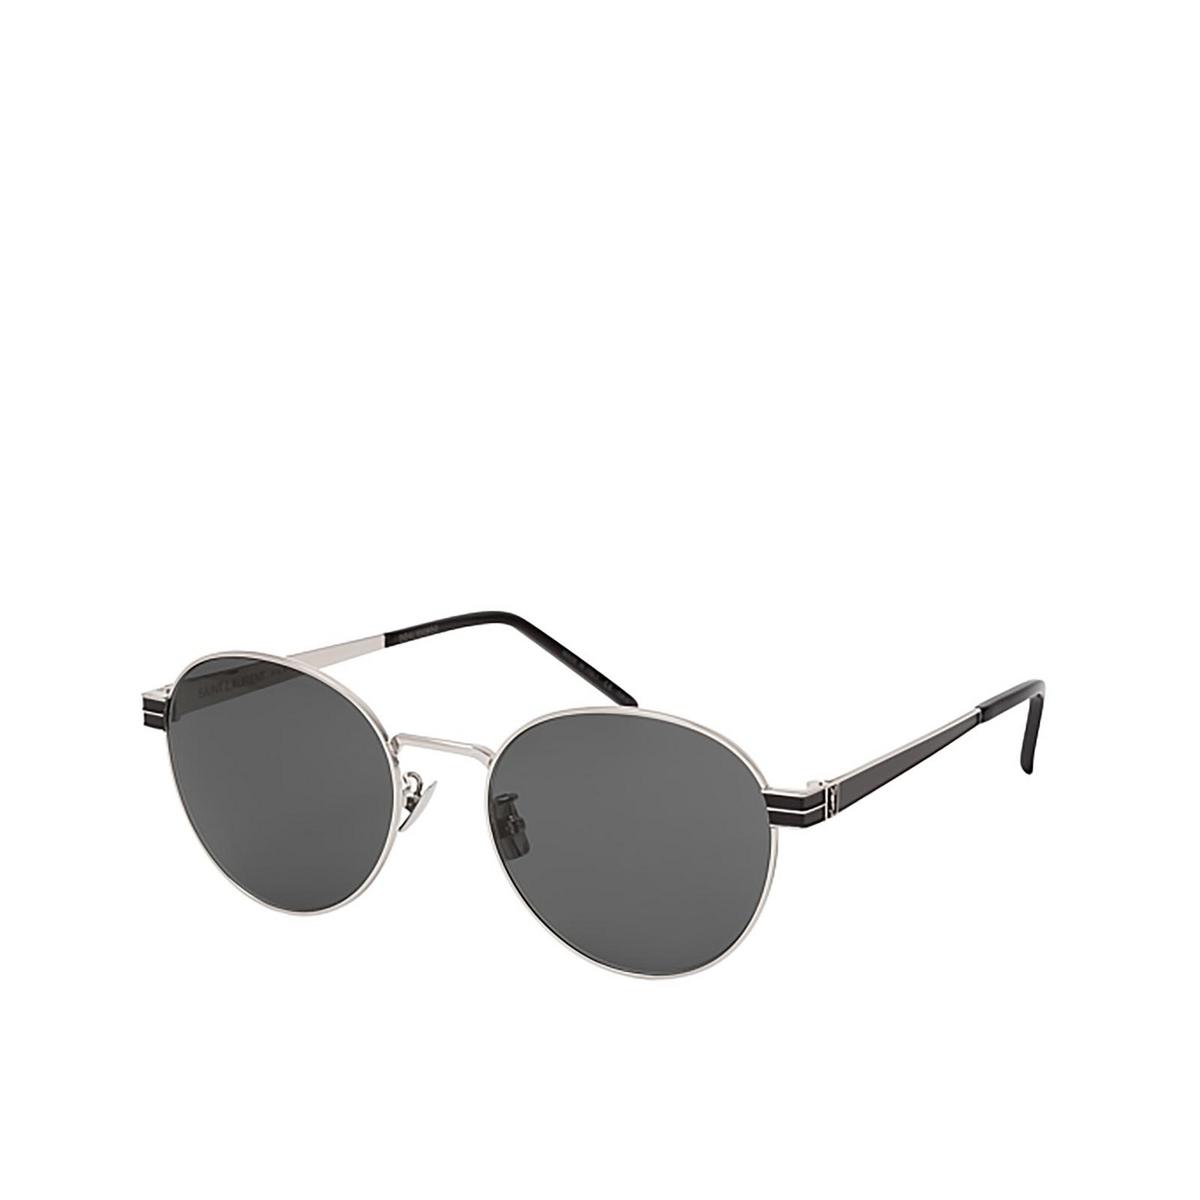 Saint Laurent® Round Sunglasses: SL M65 color Silver 001 - three-quarters view.